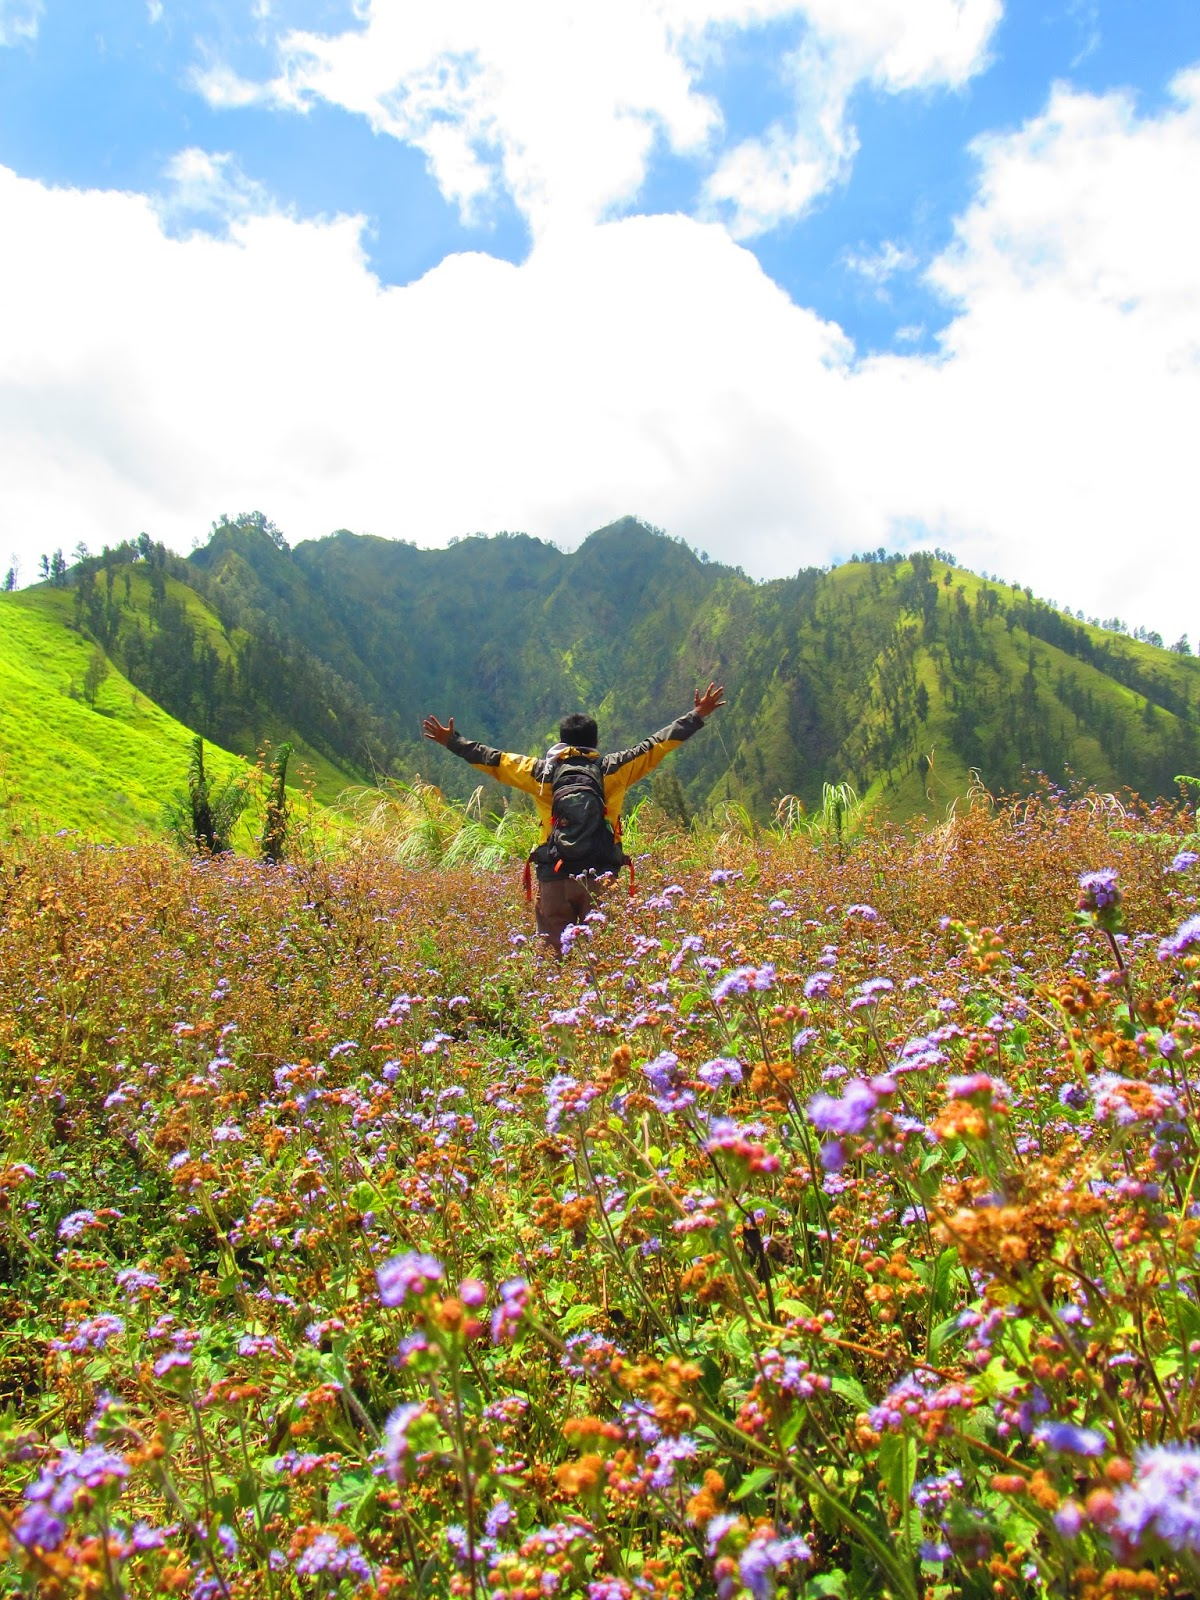 Taman Galuh Surga Tersembunyi Kaki Gunung Crengih Gus Bolang Bondowoso